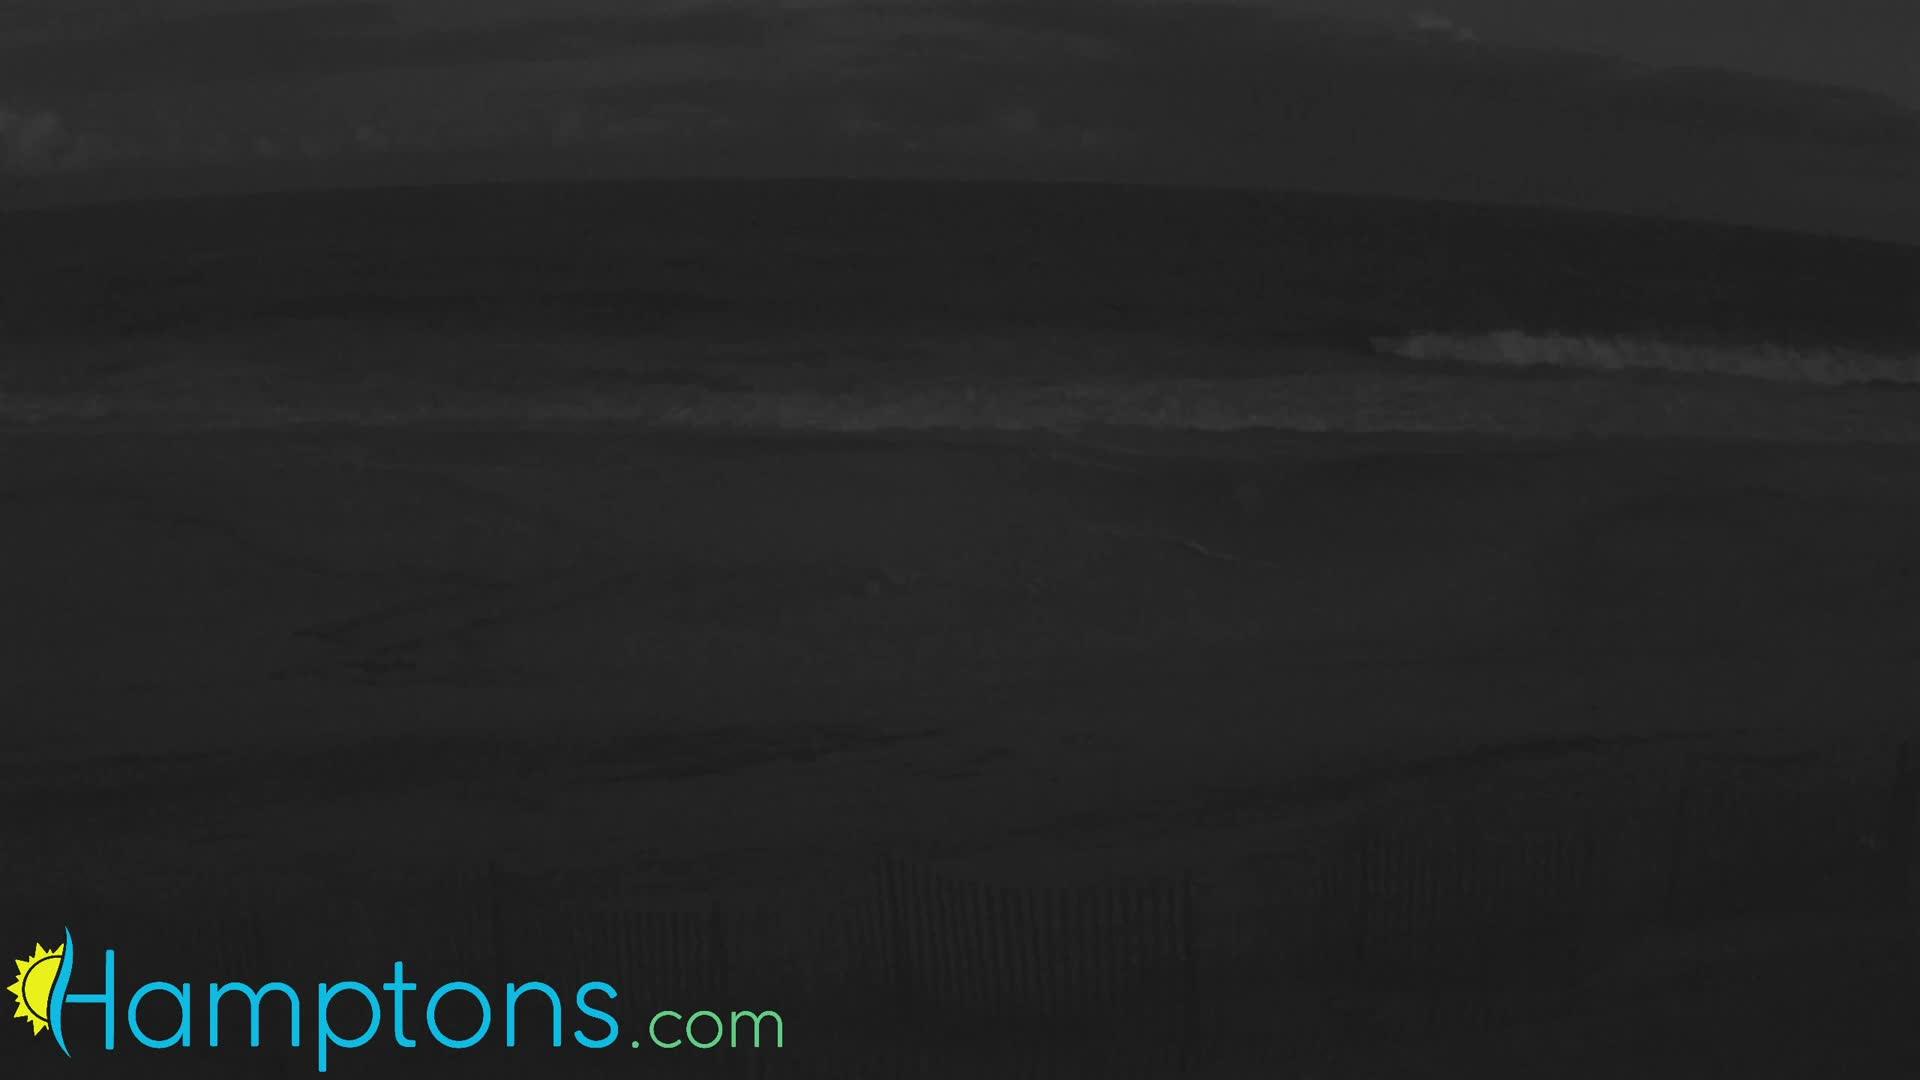 Tiana Beach, Hampton Bays, New York Henri (2021)